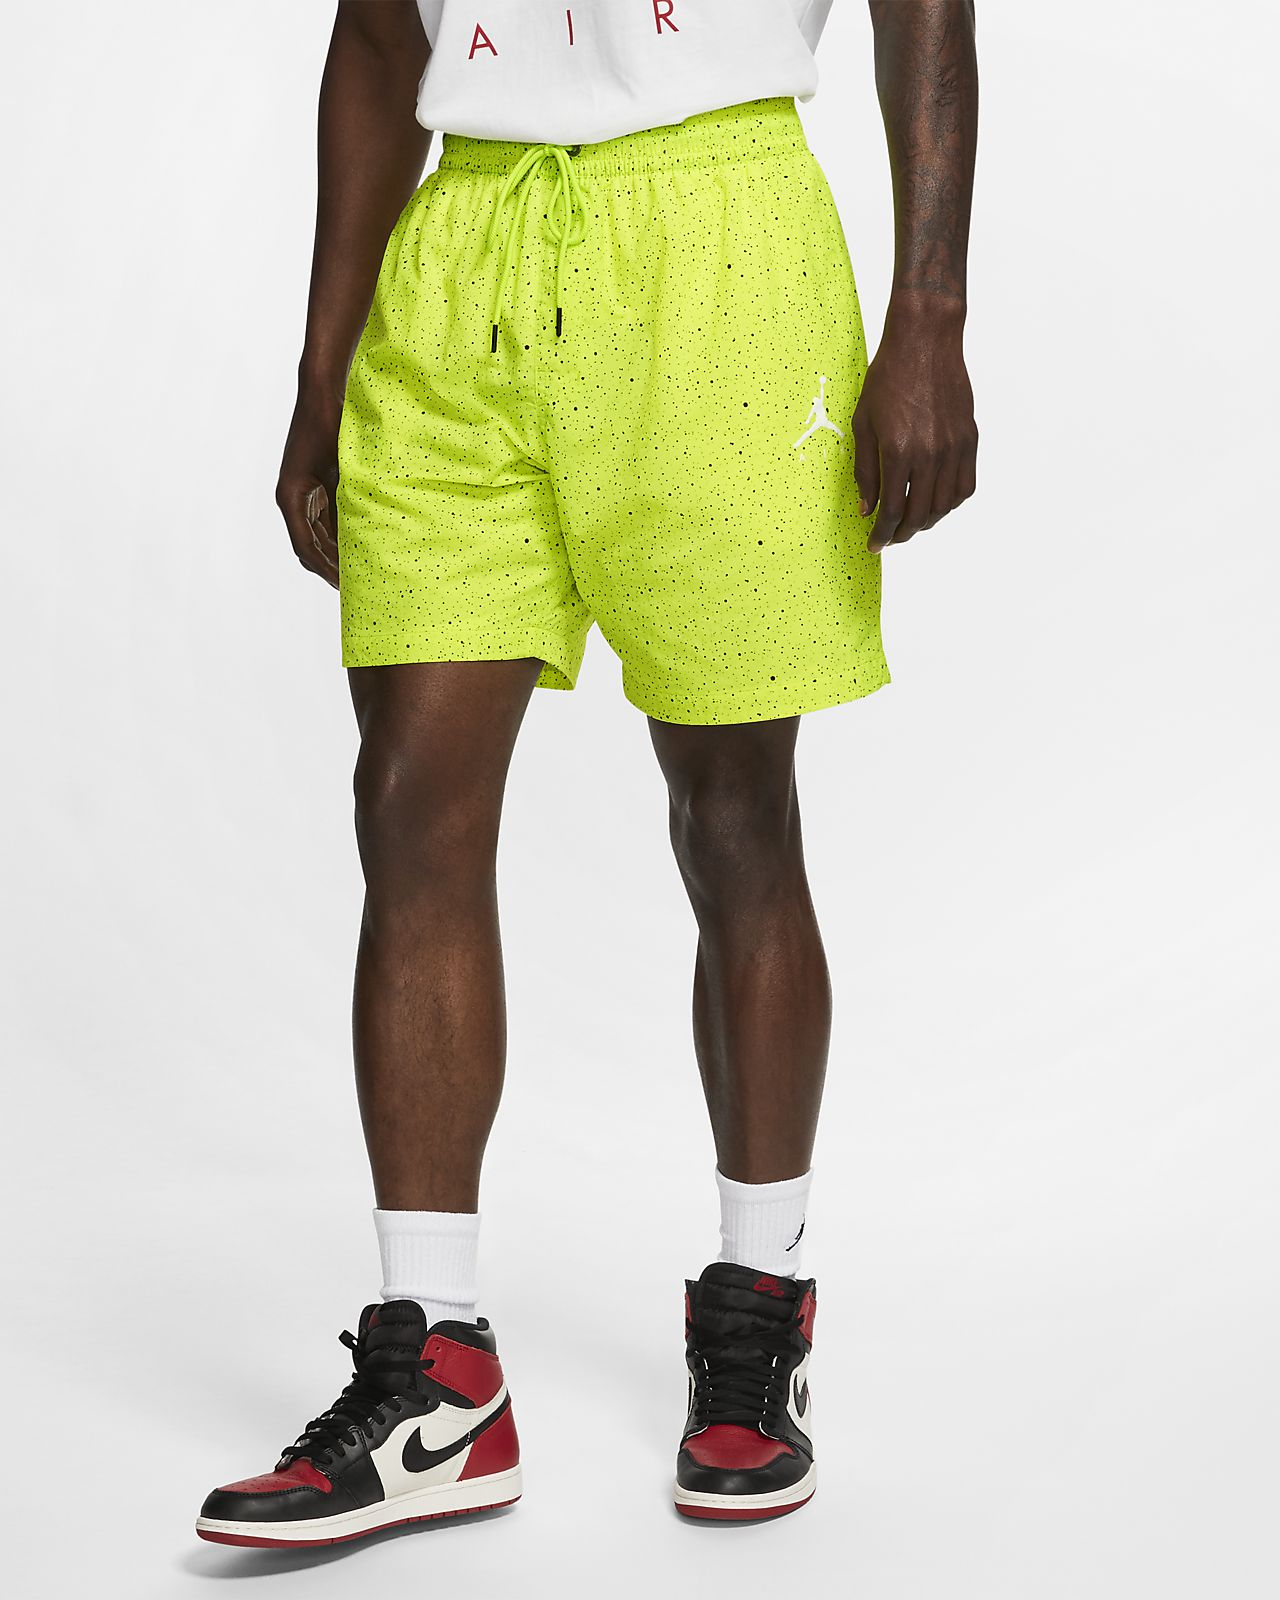 a6b94fbe0b17 Jordan Jumpman Cement Poolside Men s 18cm approx. Shorts. Nike.com DK